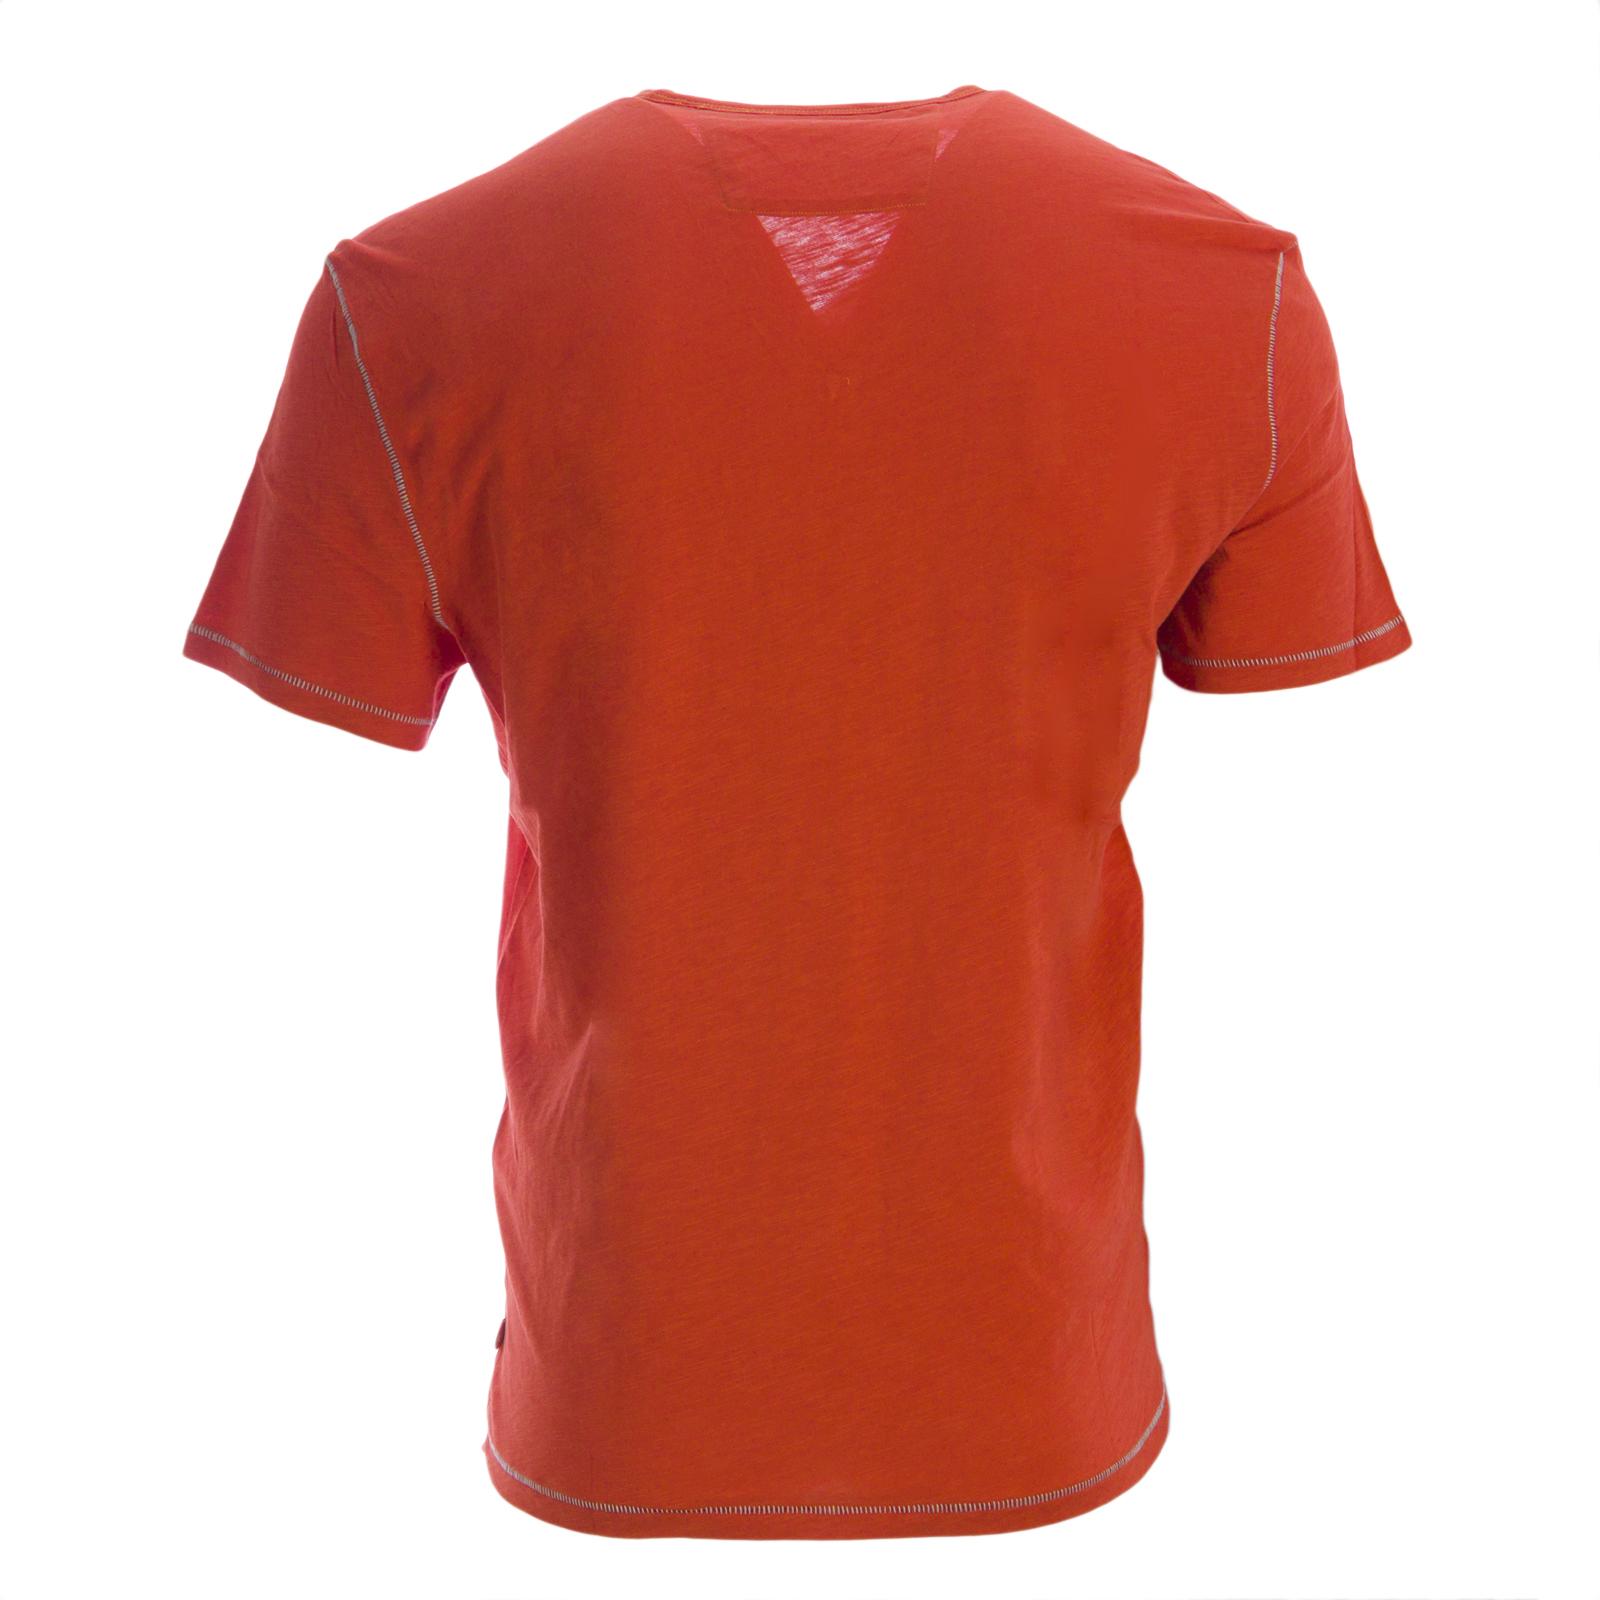 JOHN VARVATOS STAR USA Men/'s Burnout Pickstitch V-Neck Tee $69.50 NWT